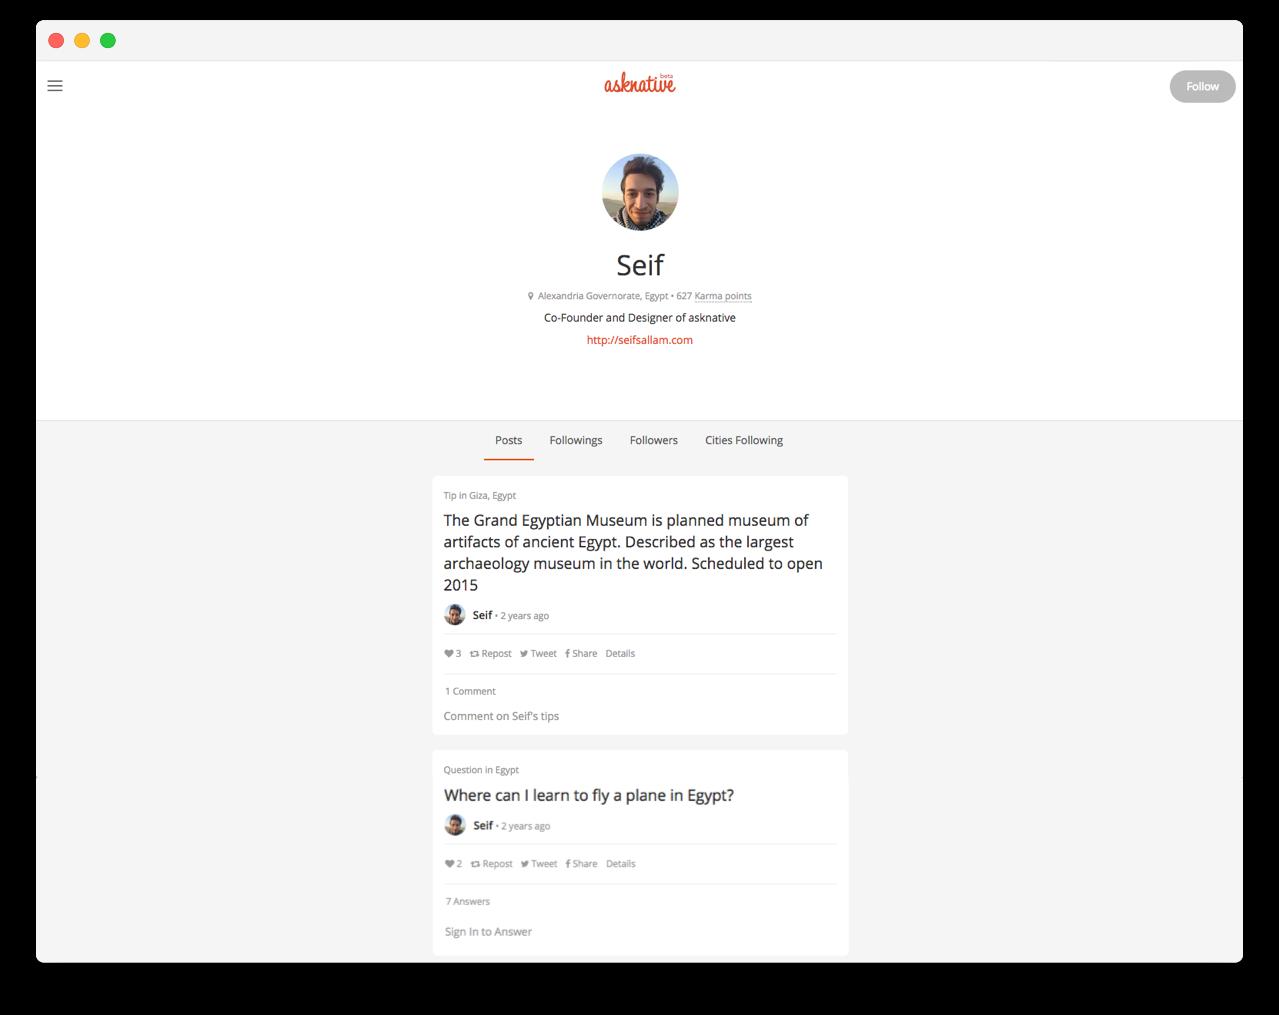 asknative-web-profile